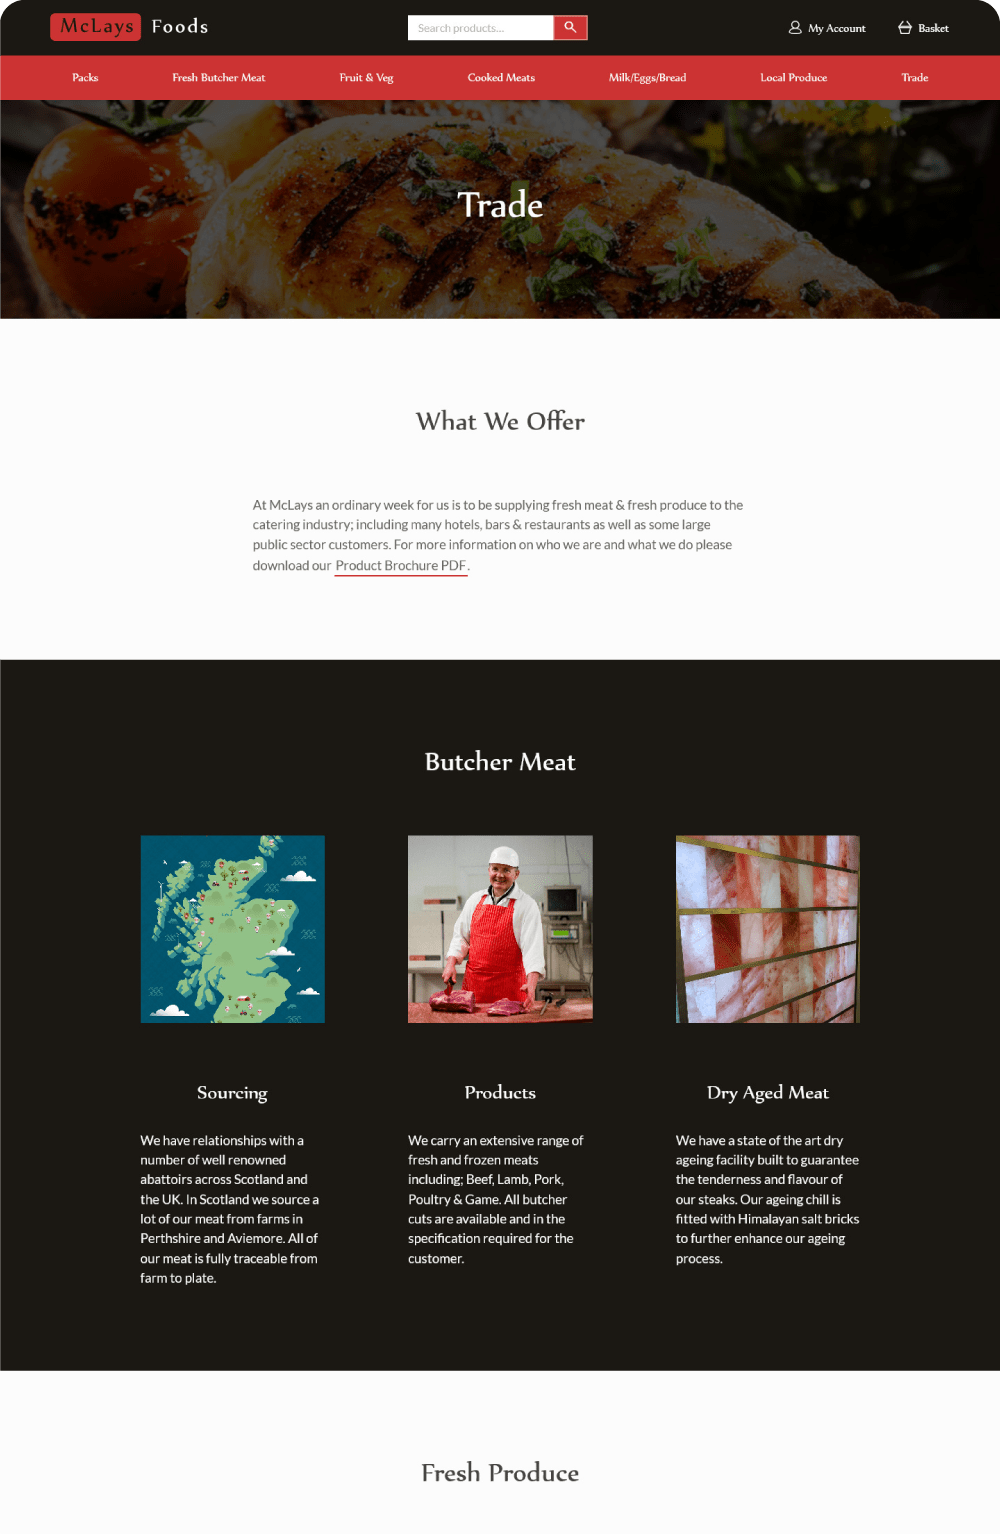 McLays trade page on desktop